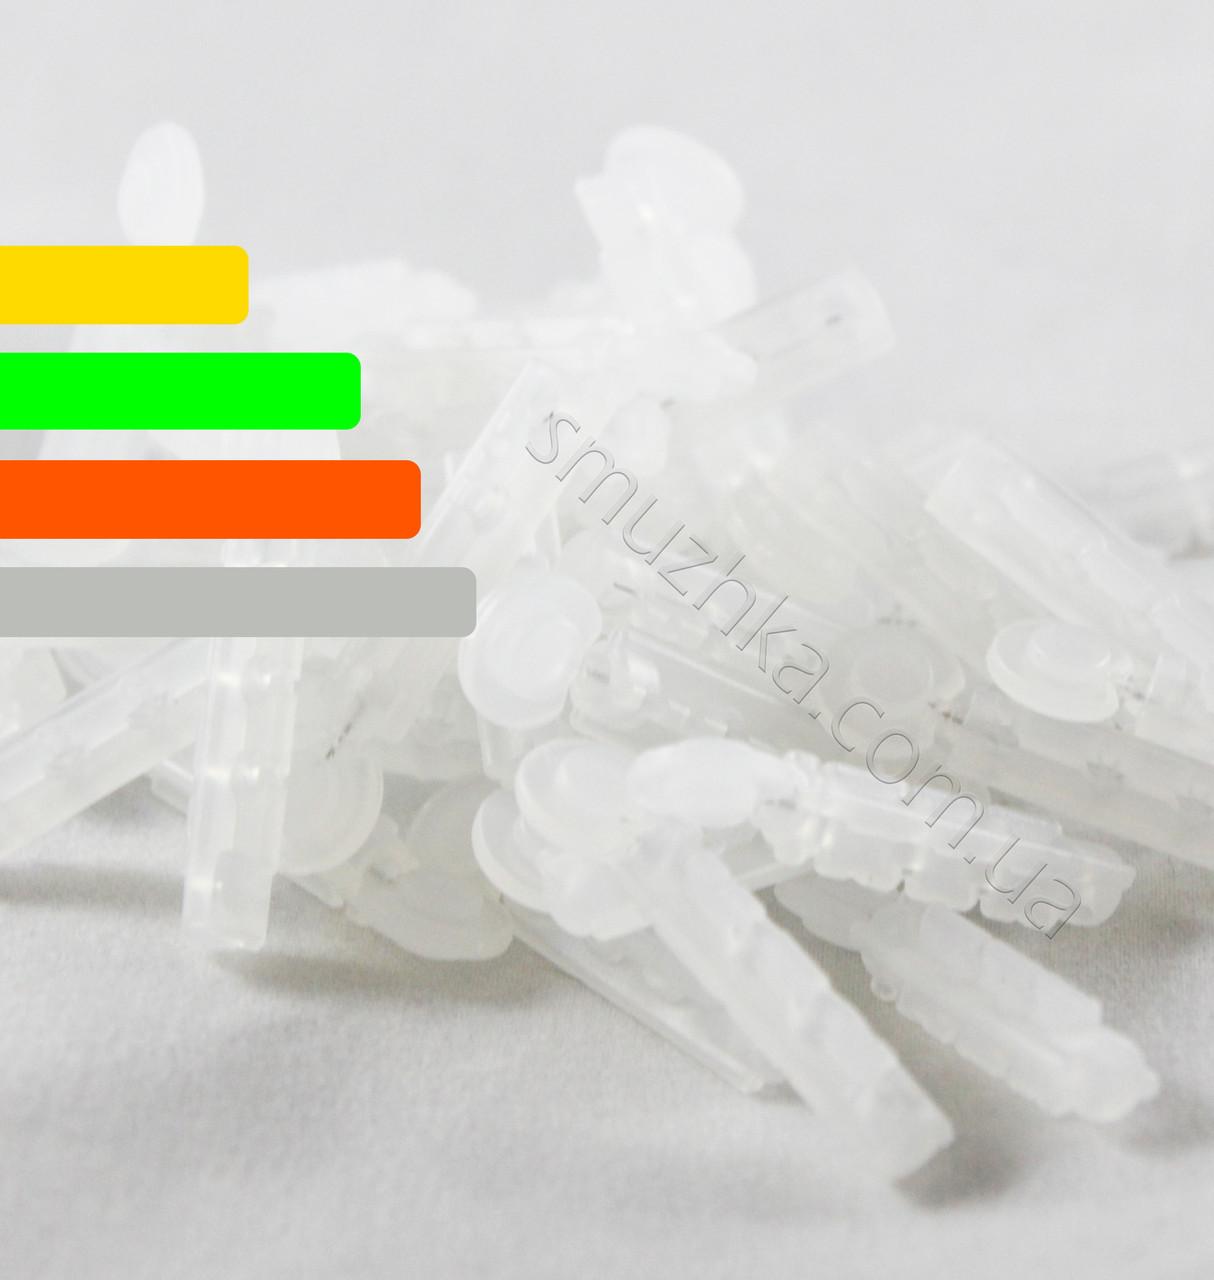 Ланцеты медицинские 33G- On Call, Freestyle, Bionime поштучно